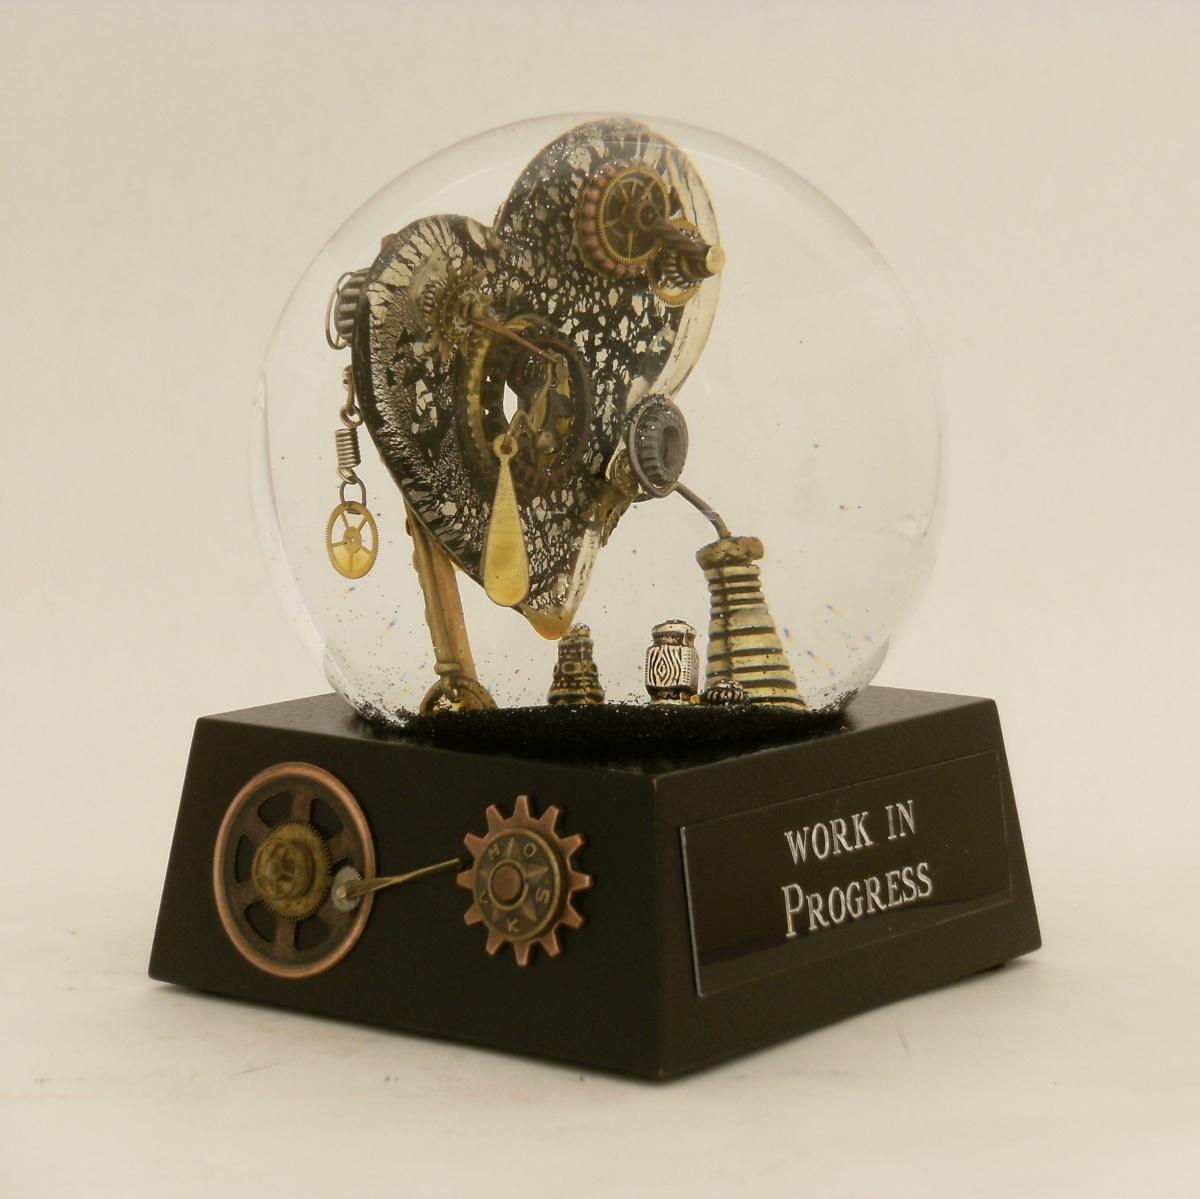 Work in Progress Heart snow globe, Camryn Forrest Designs 2013